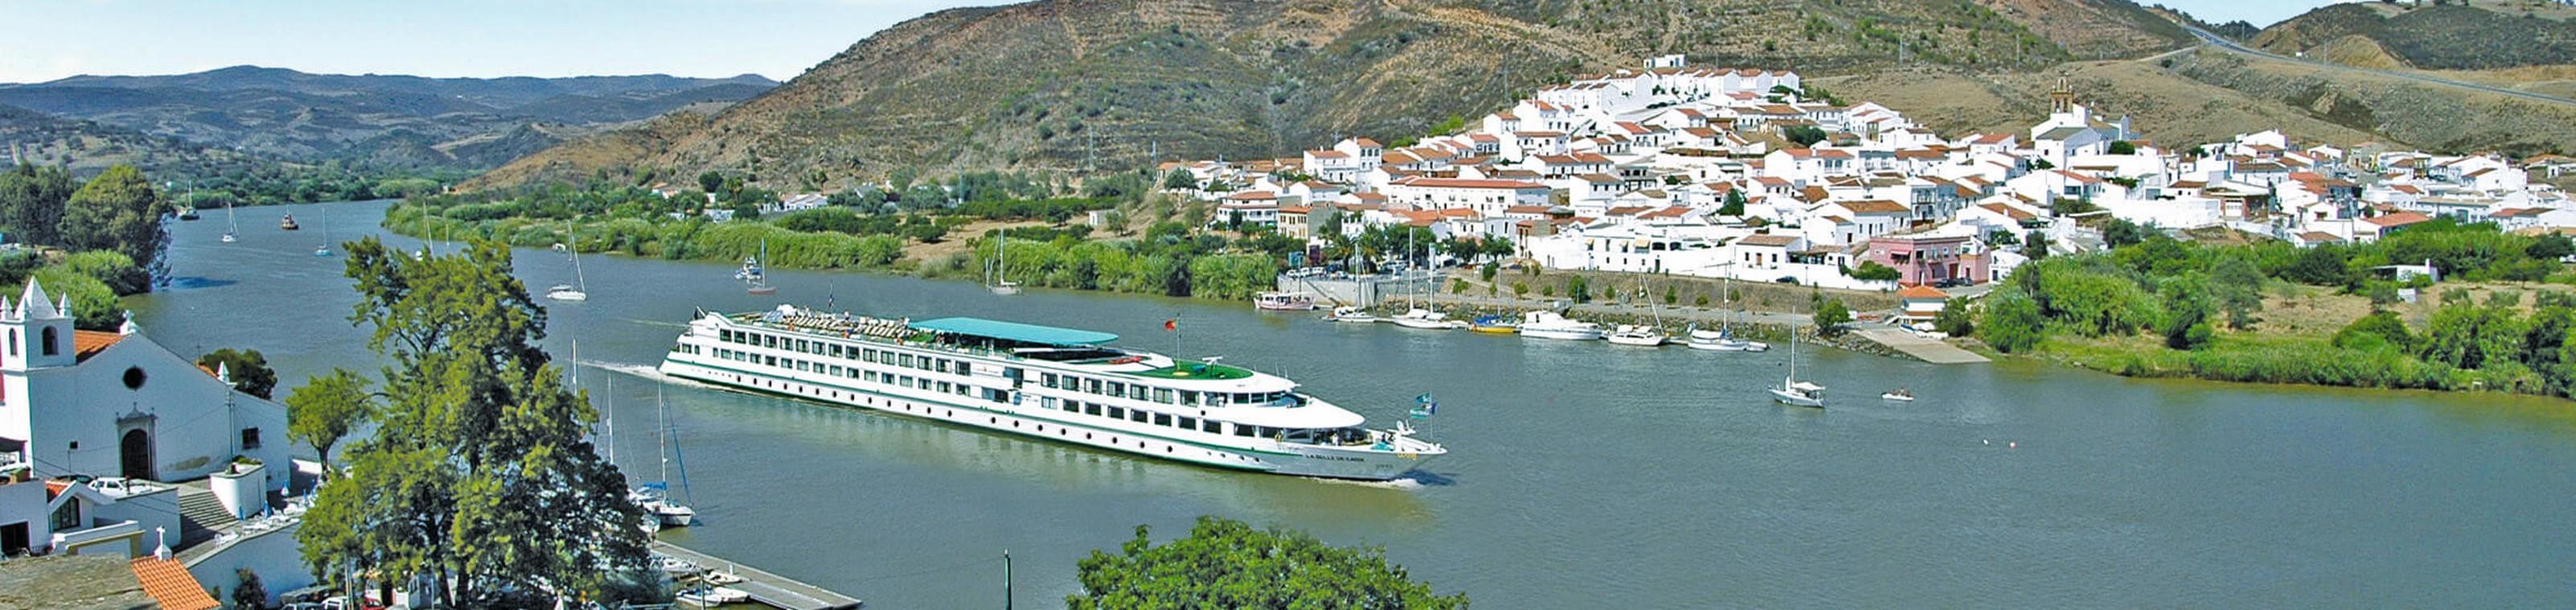 Riviercruise Andalusië en Algarve